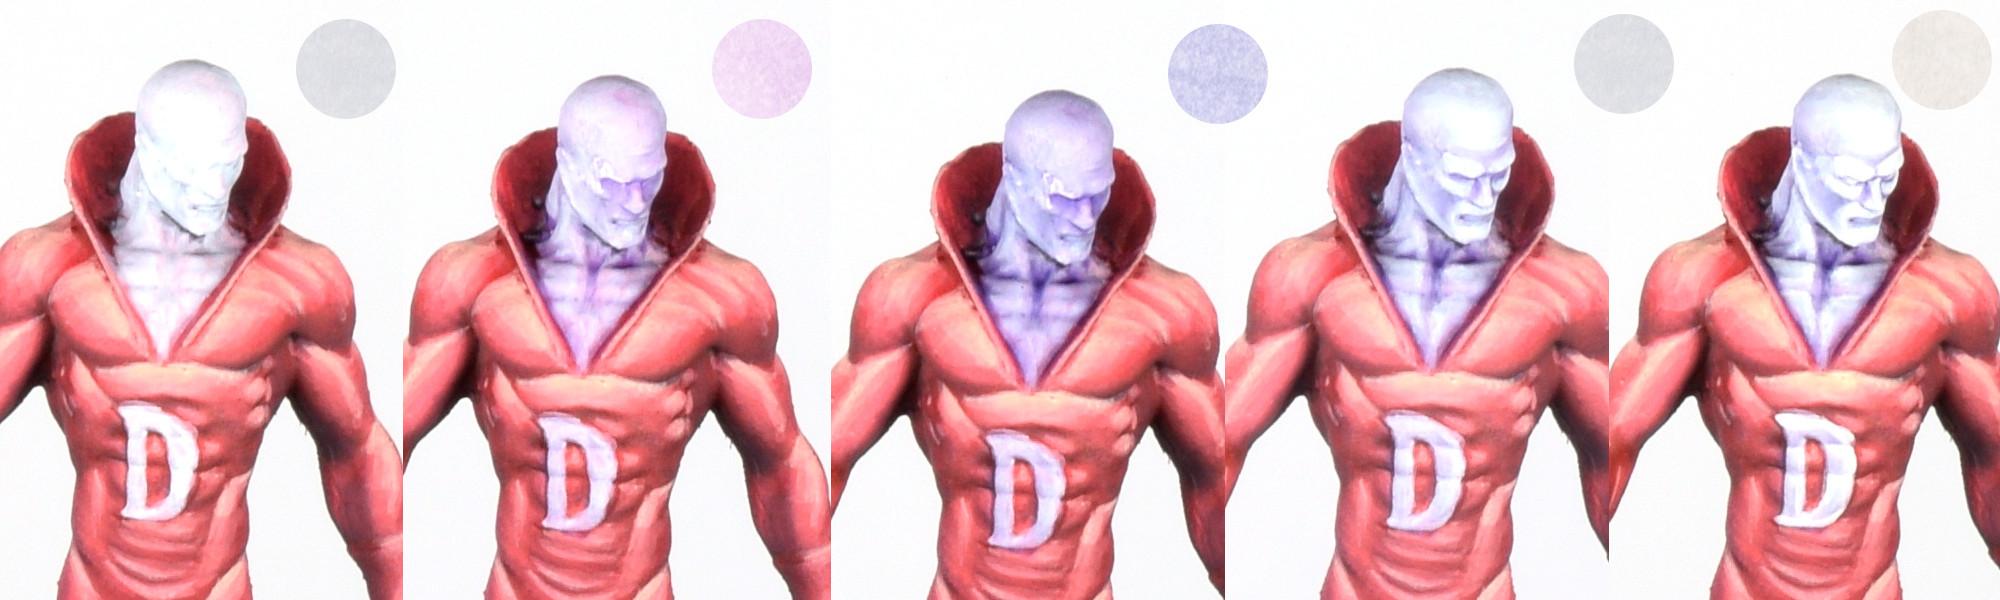 Deadman 15.JPG